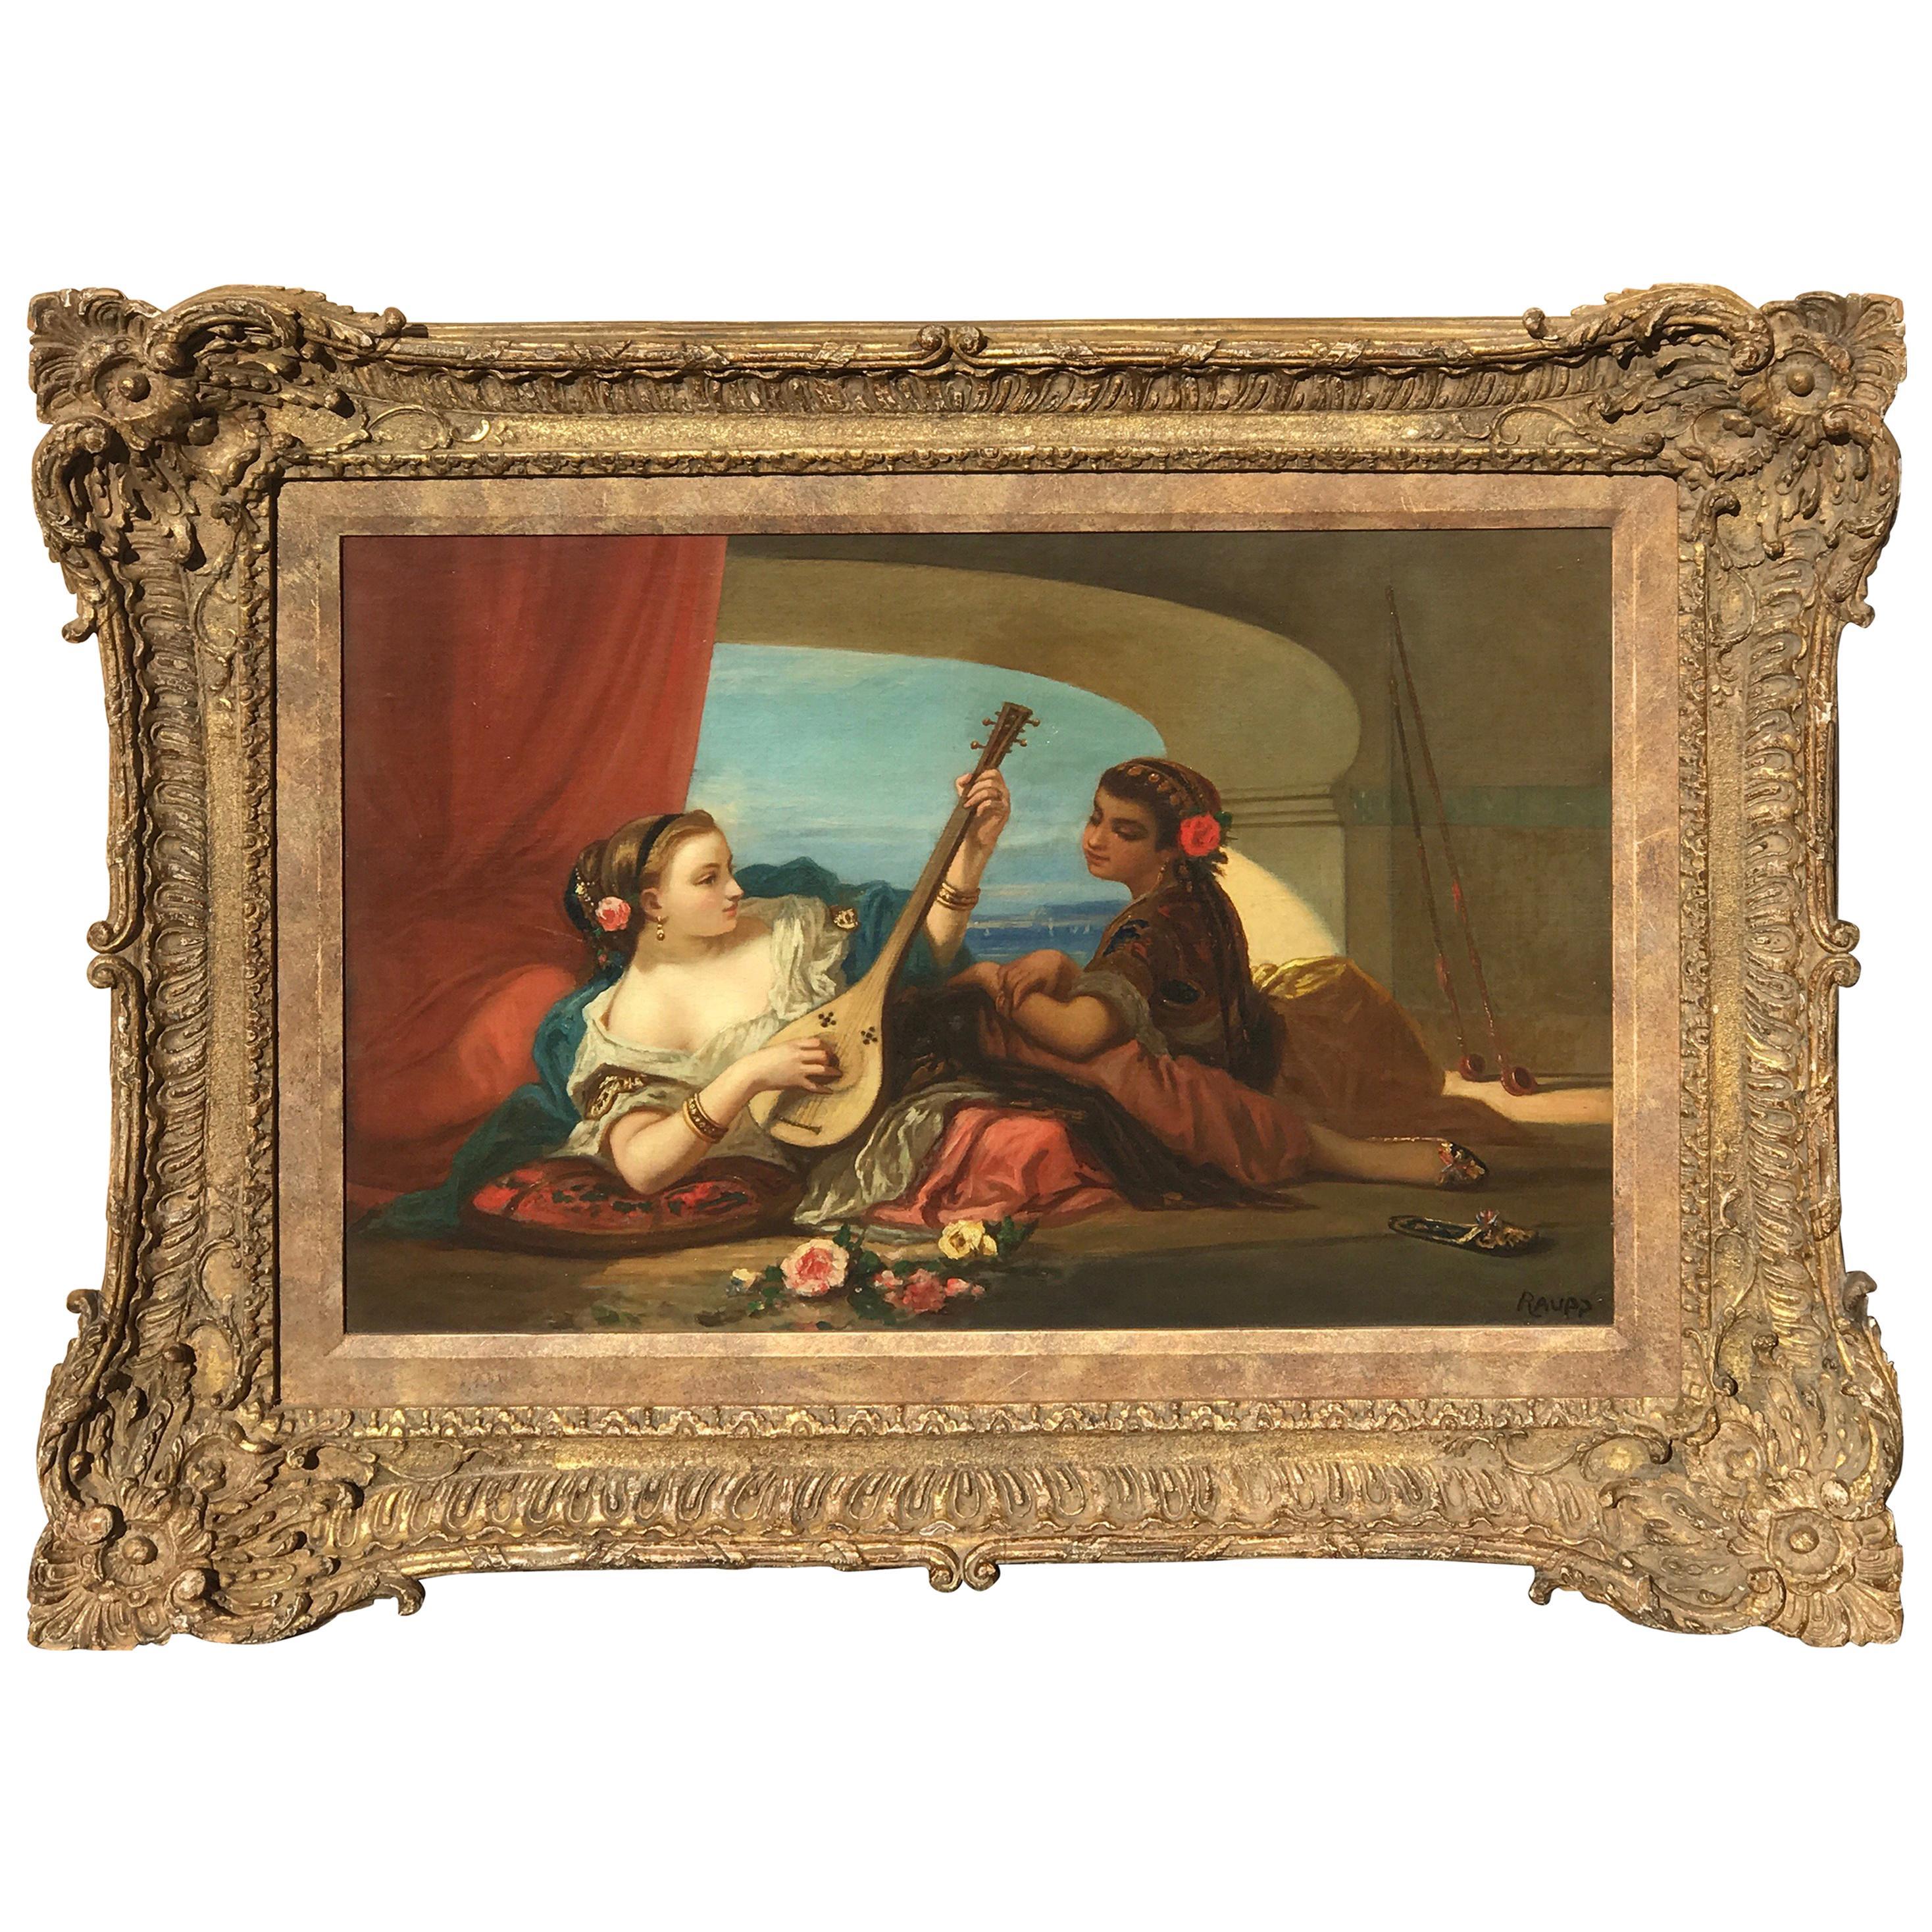 Orientalist Oil on Canvas, Signed Raupp